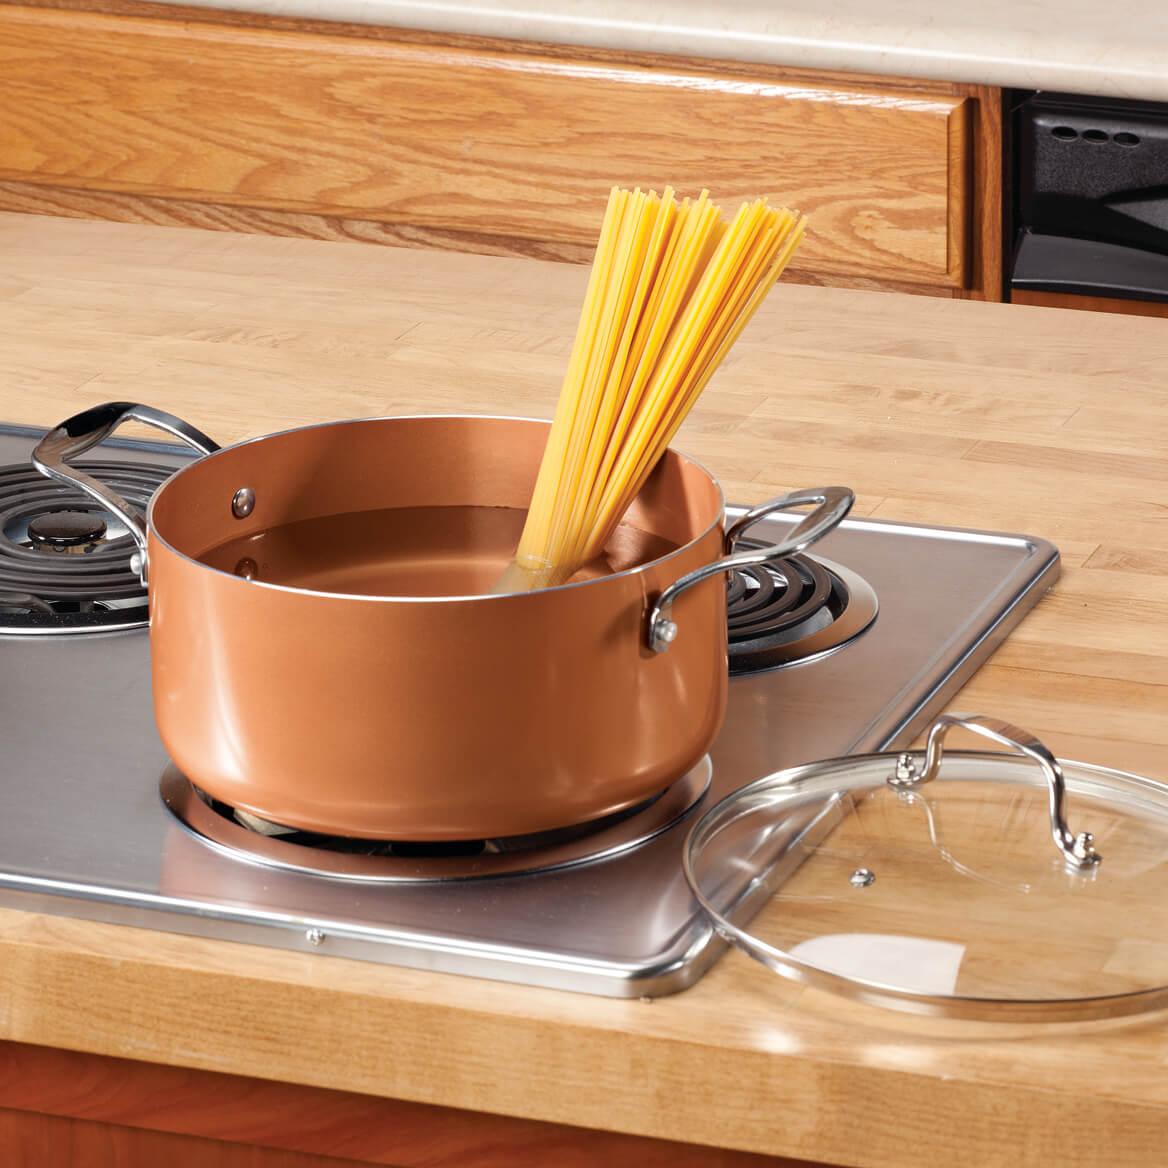 Ceramic Non Stick Sauce Pan With Lid 5 Qt Nonstick Pan